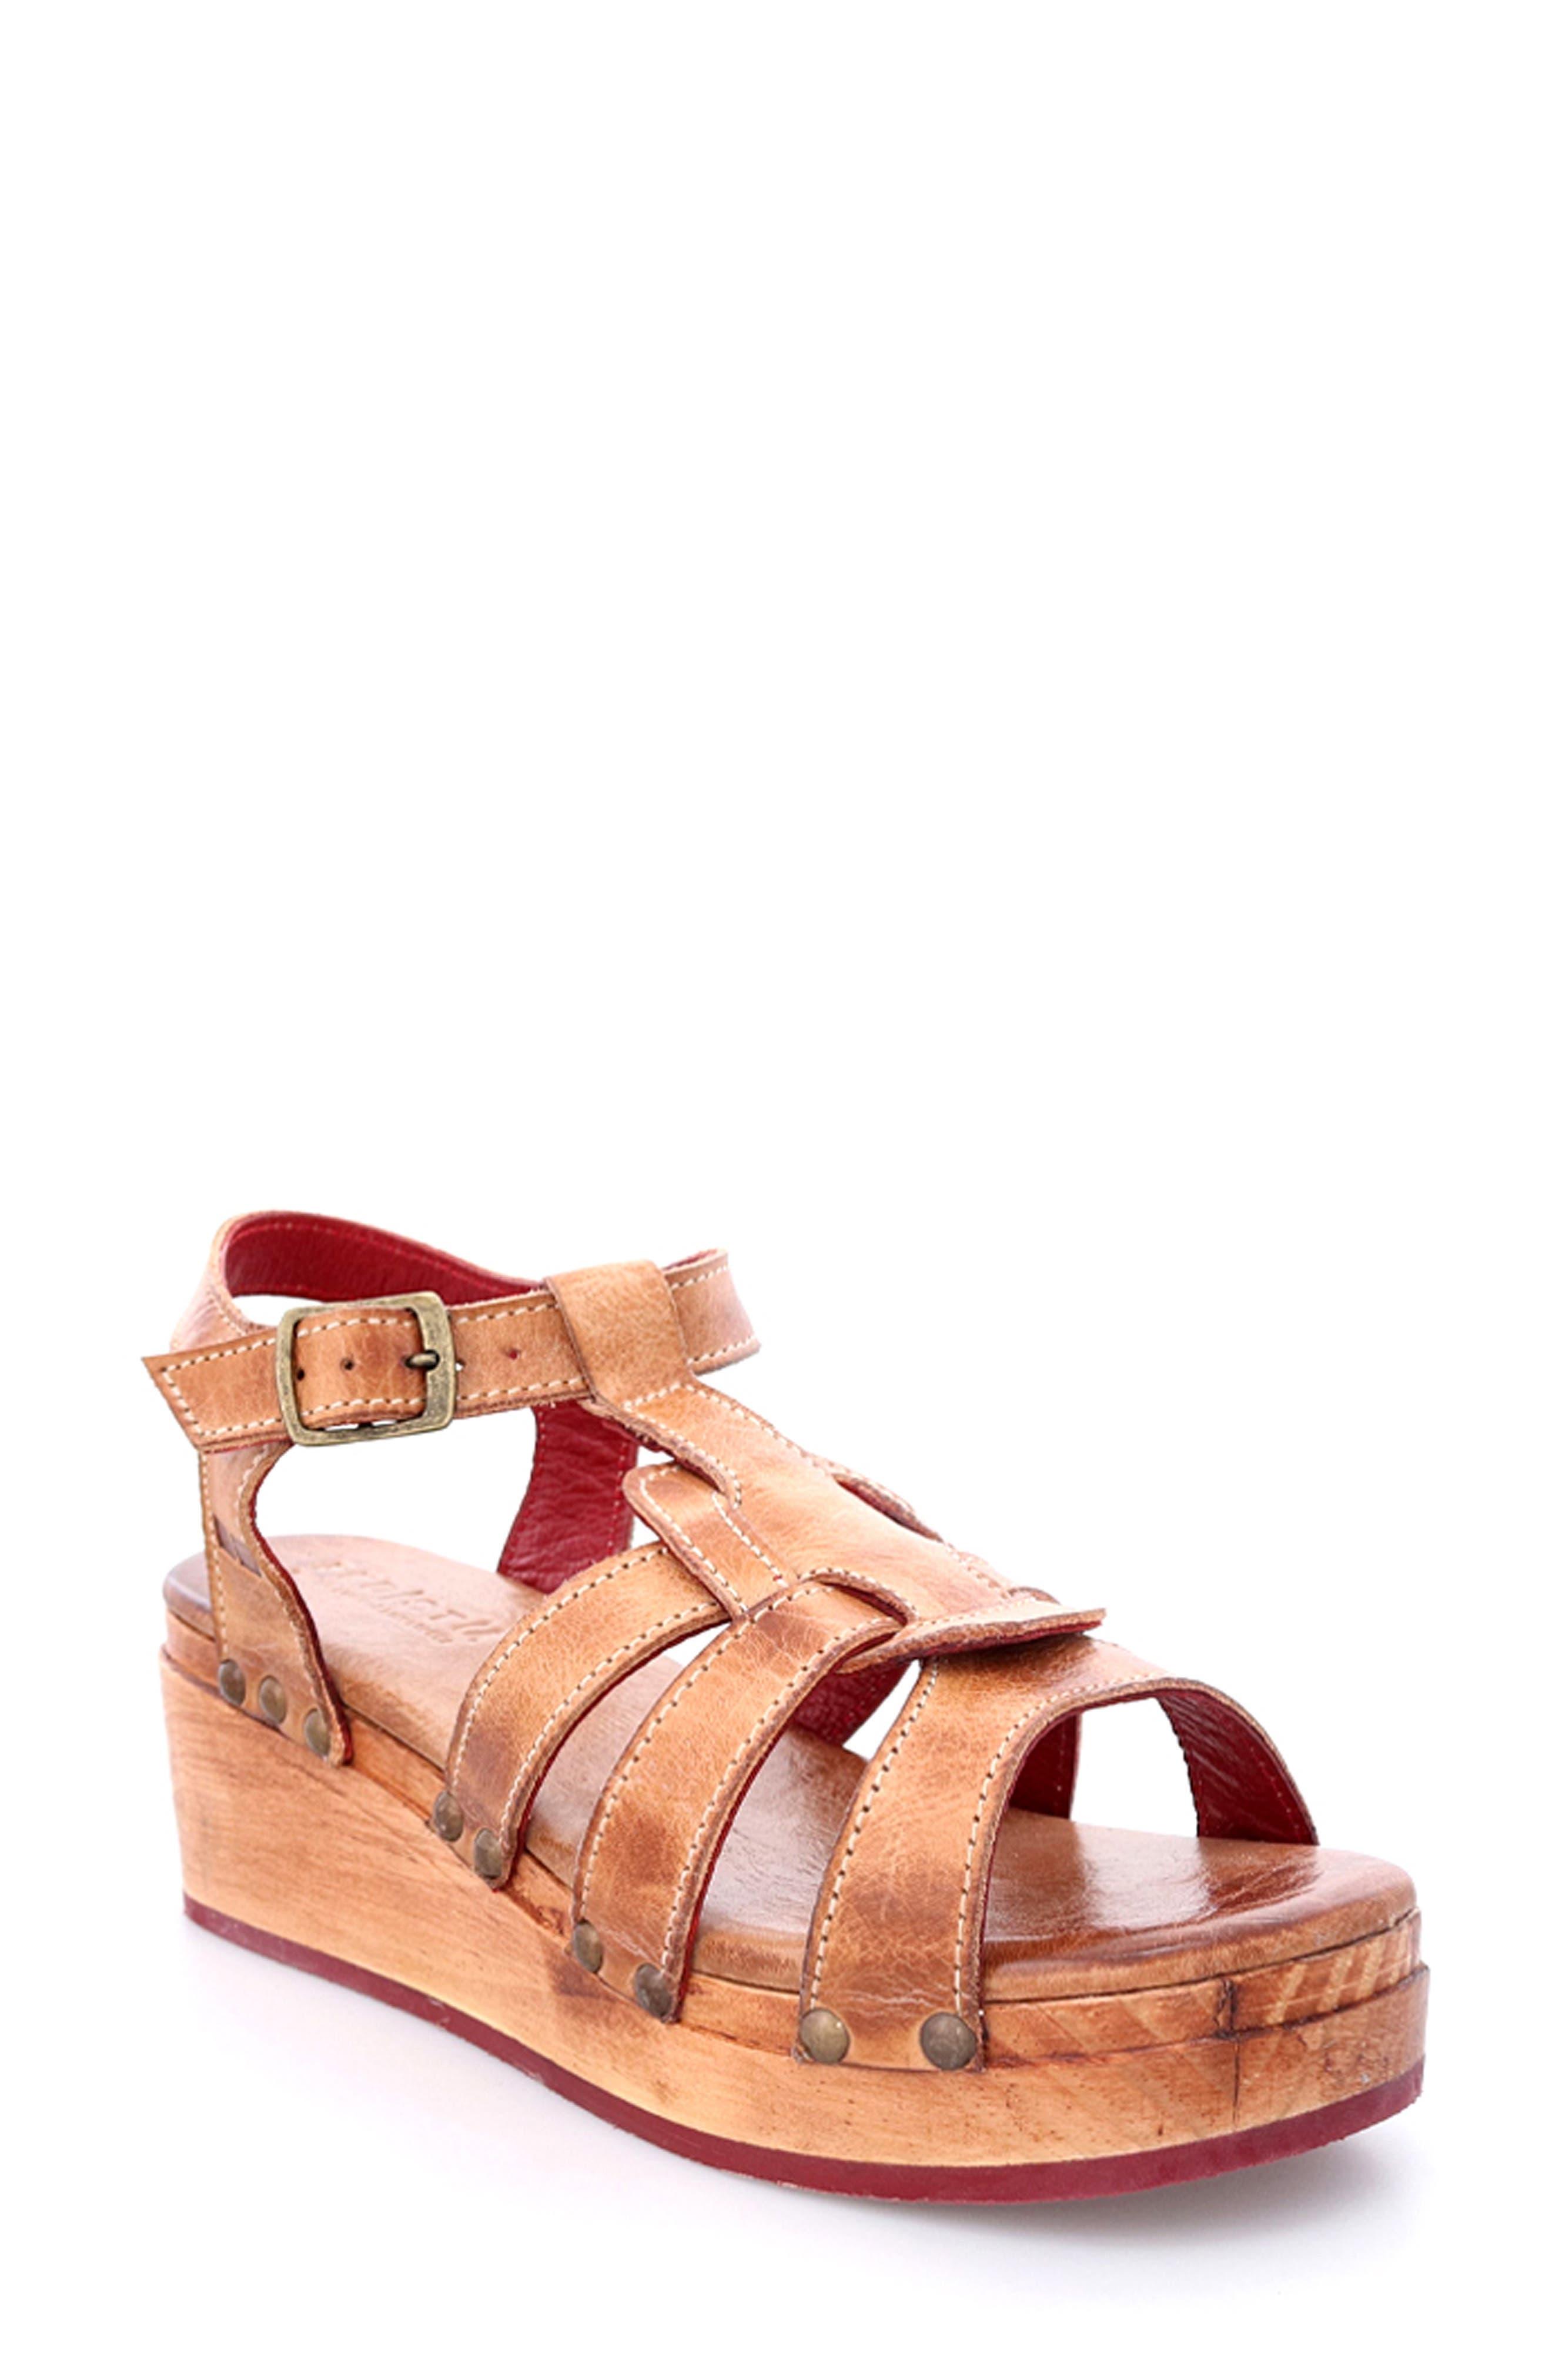 Fabiola Platform Sandal